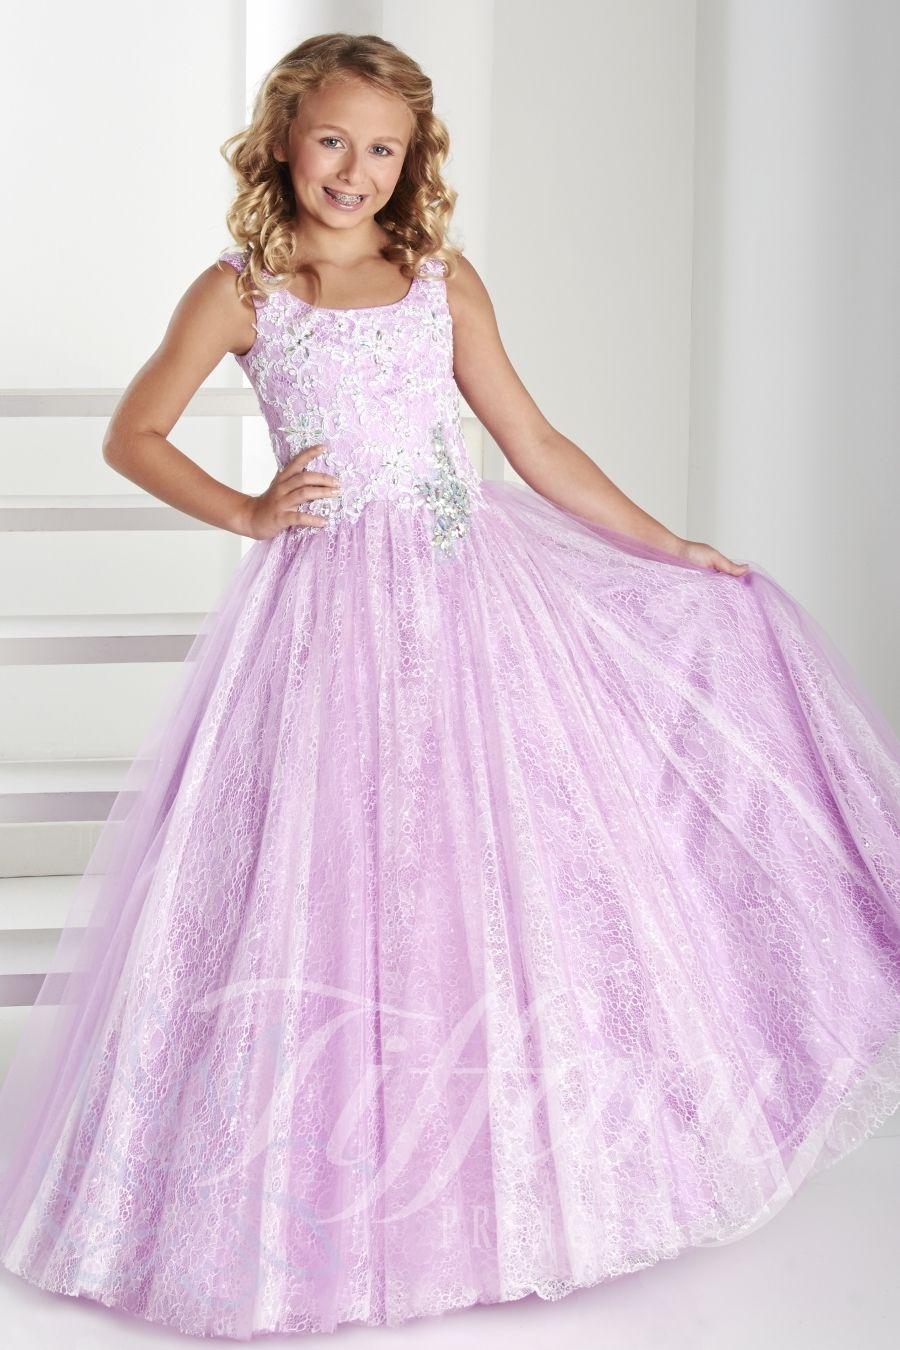 Tiffany Princess Little Girls Dress 13411 - Everything4pageants.com ...